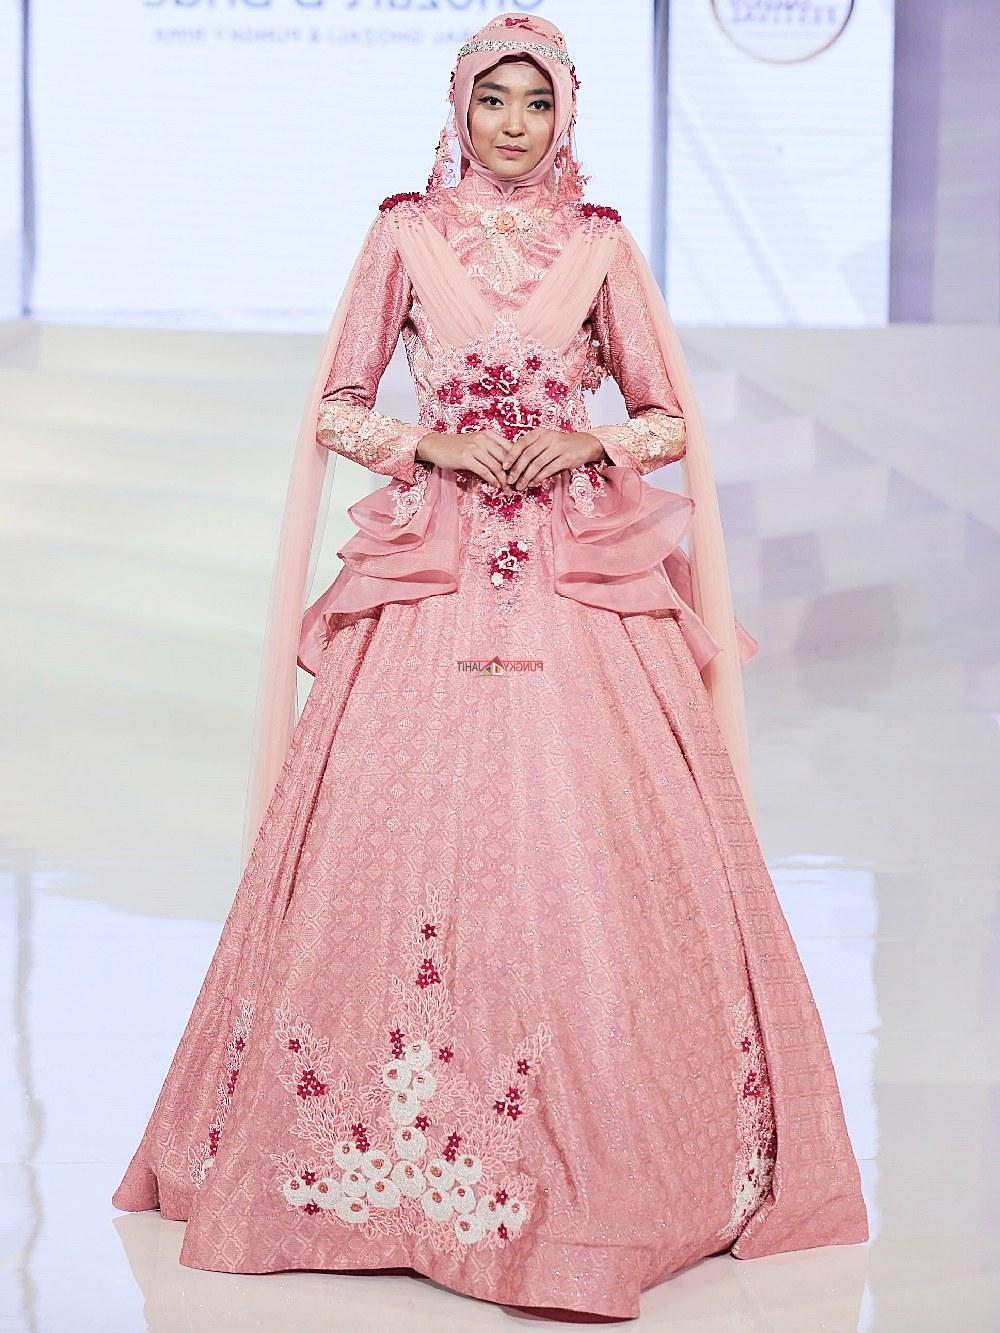 Design Sewa Baju Pengantin Muslimah Murah Irdz Sewa Perdana Baju Pengantin Muslimah Jogja Gaun Pengantin